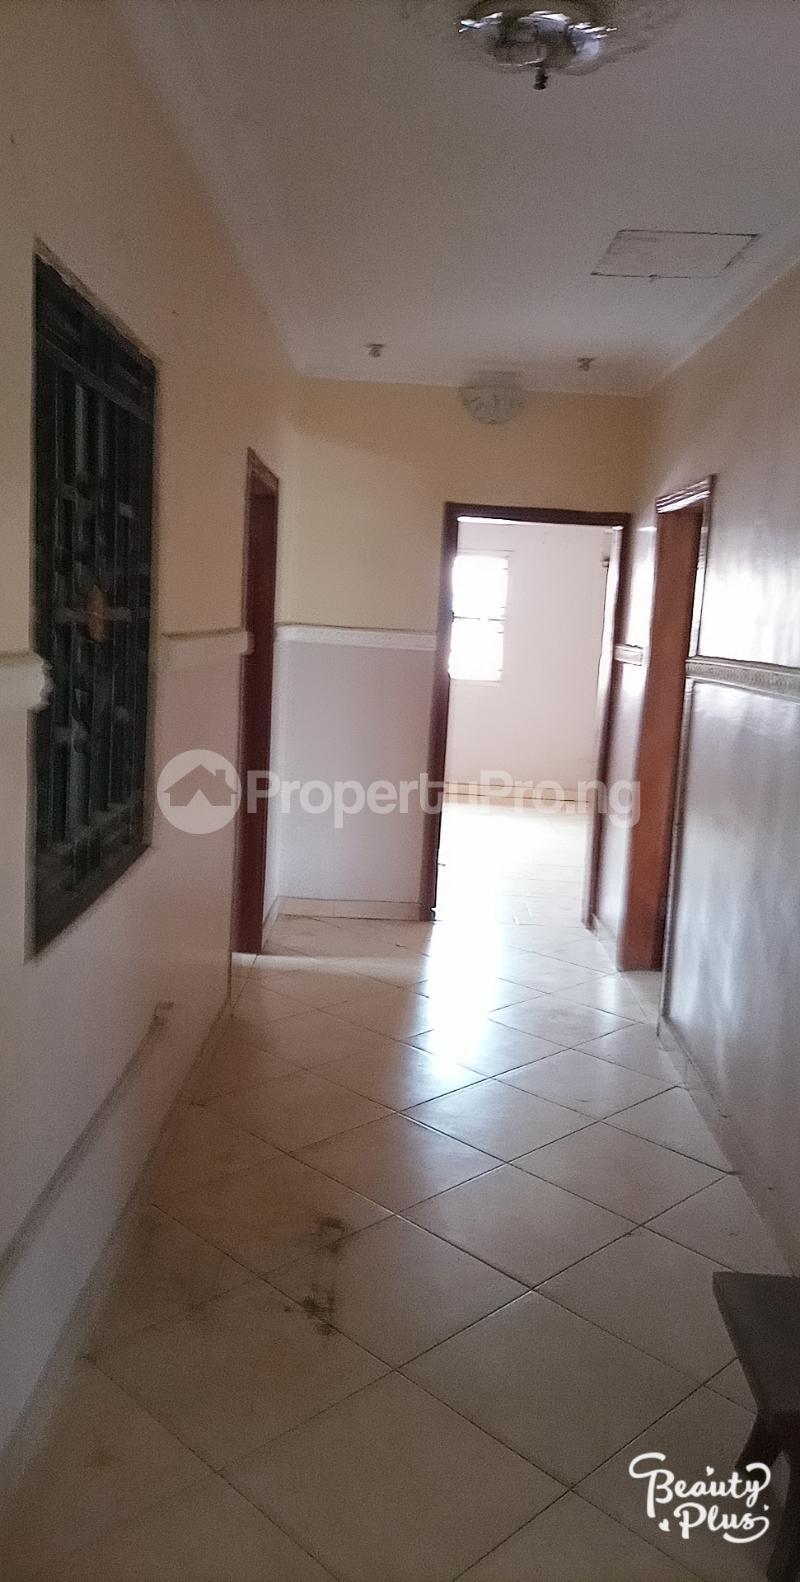 5 bedroom Detached Duplex House for sale Ajao Estate Isolo. Lagos Mainland Ajao Estate Isolo Lagos - 10